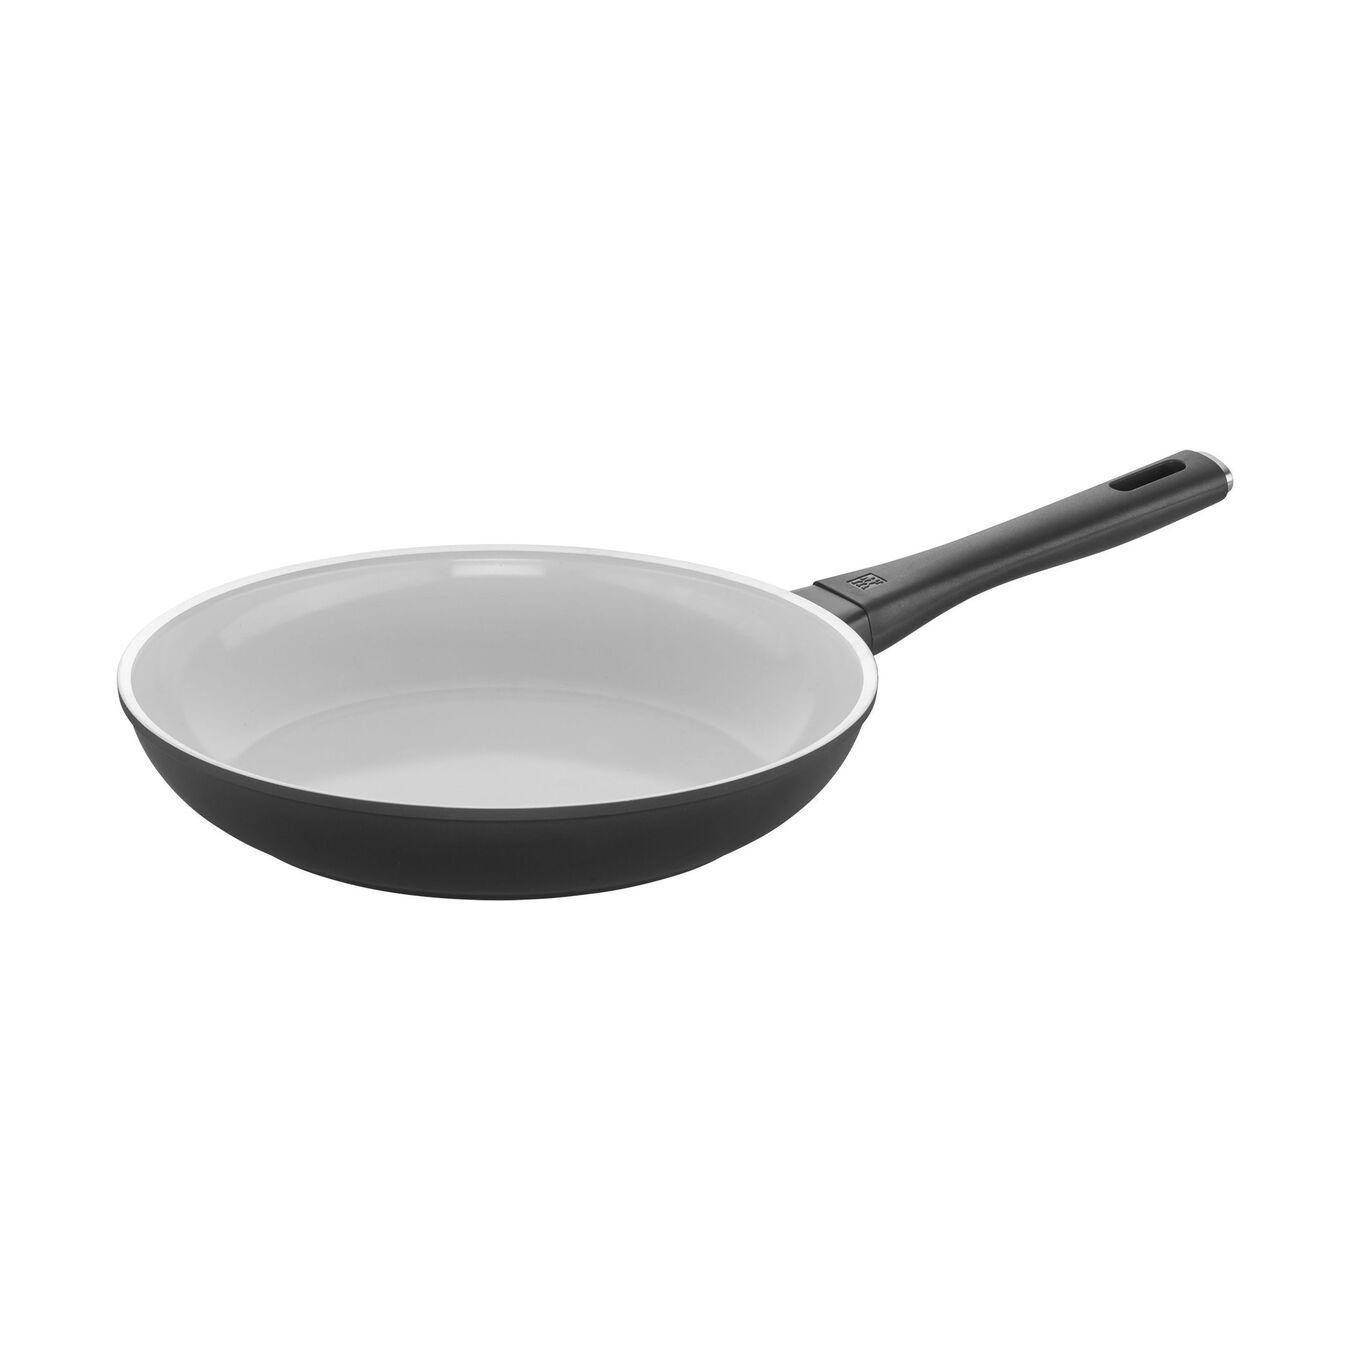 4-pc, Aluminum, Non-stick, Frying pan set,,large 4